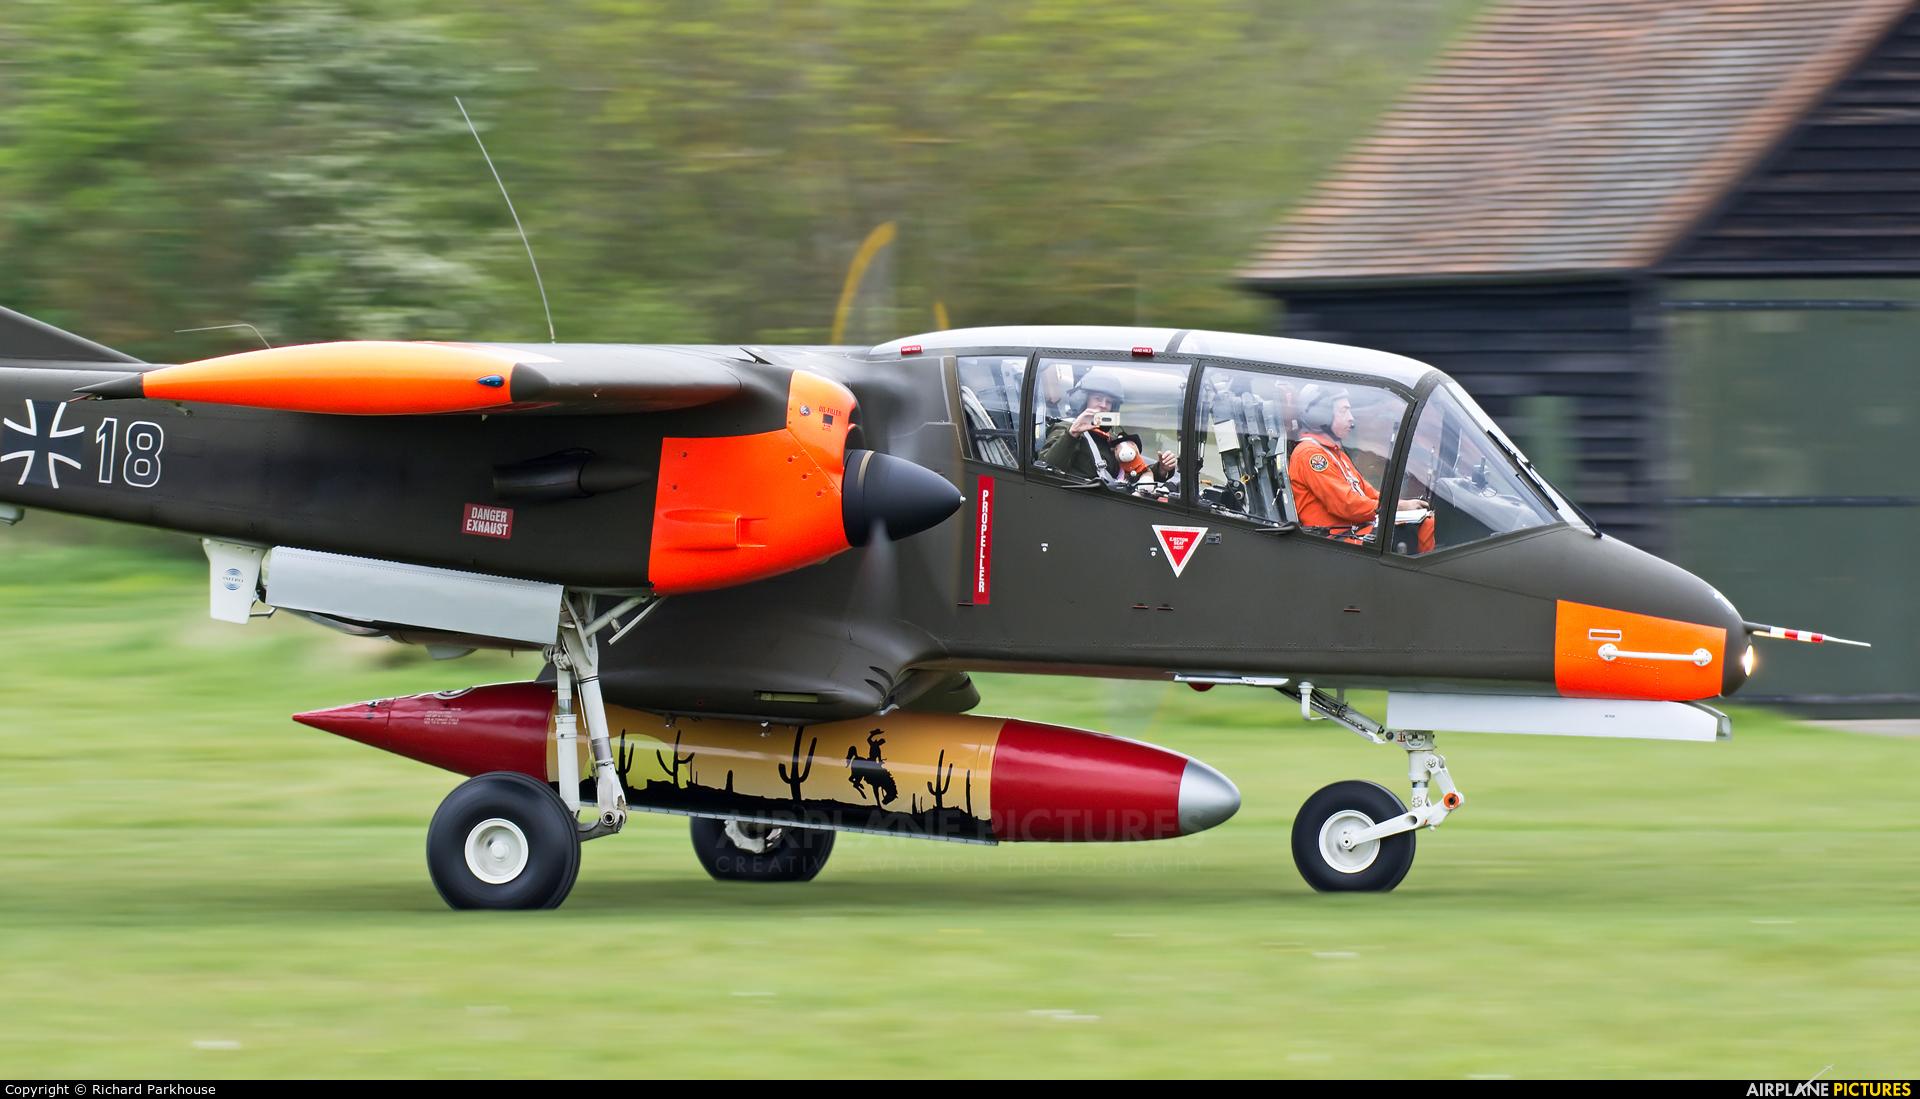 Bronco Demo Team G-ONAA aircraft at Old Warden